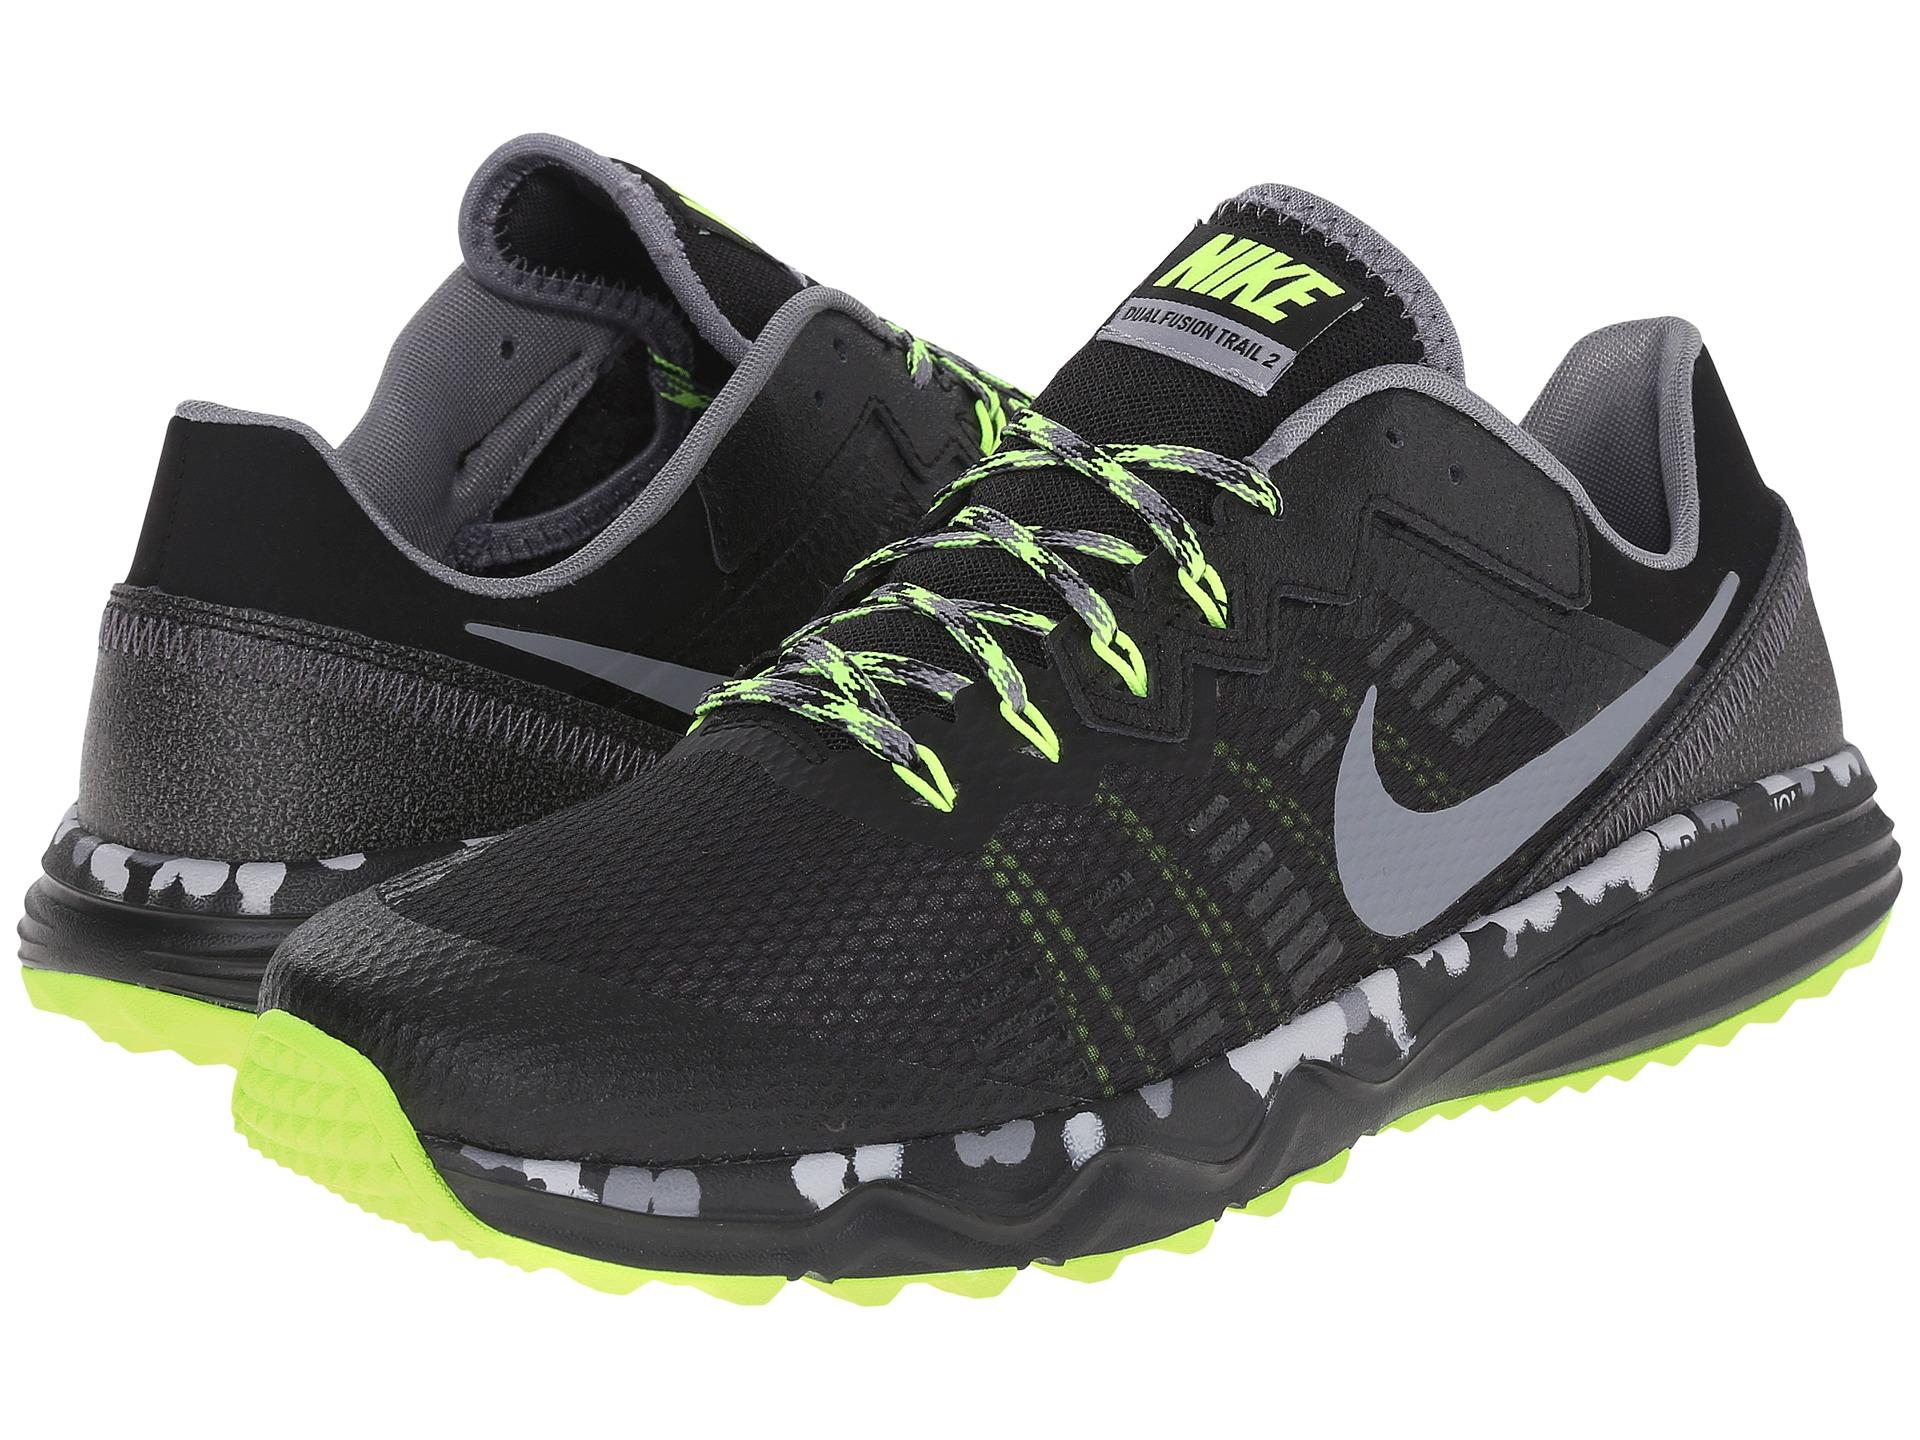 b5406bb9f14d2b Nike Air Max 97 Reflective